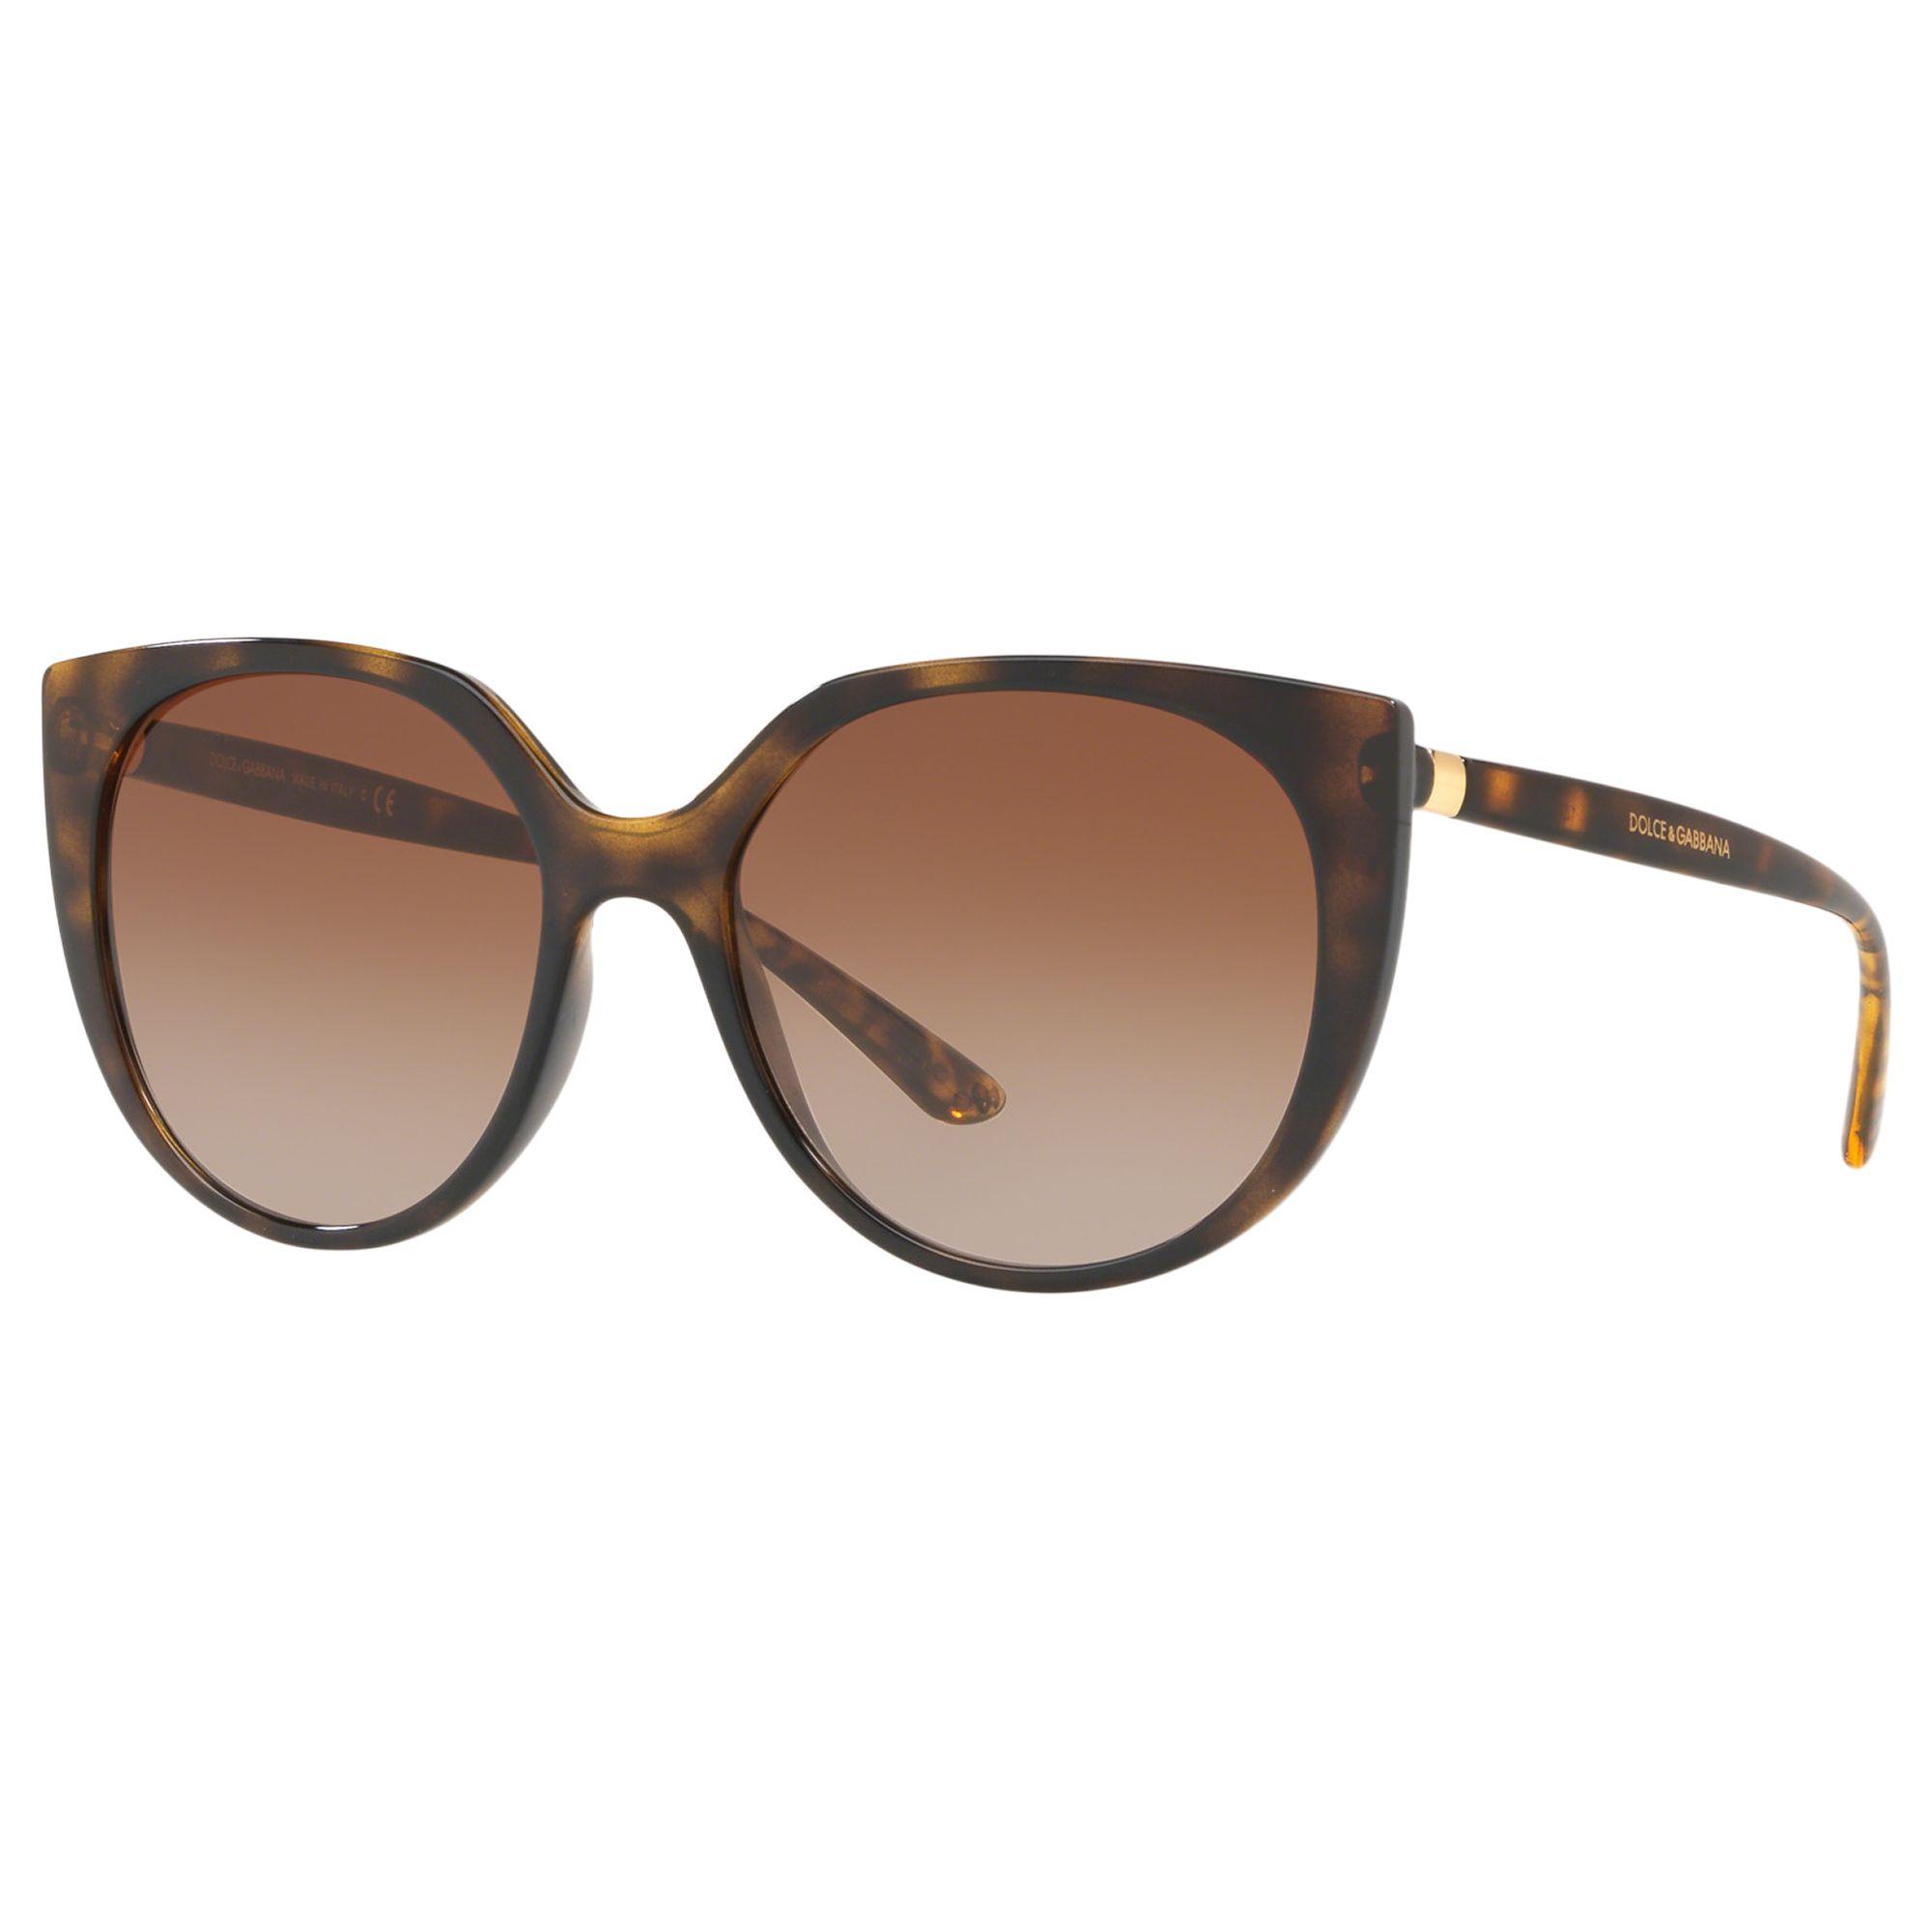 Dolce & Gabbana Dolce & Gabbana DG6119 Women's Oval Sunglasses, Tortoise/Brown Gradient